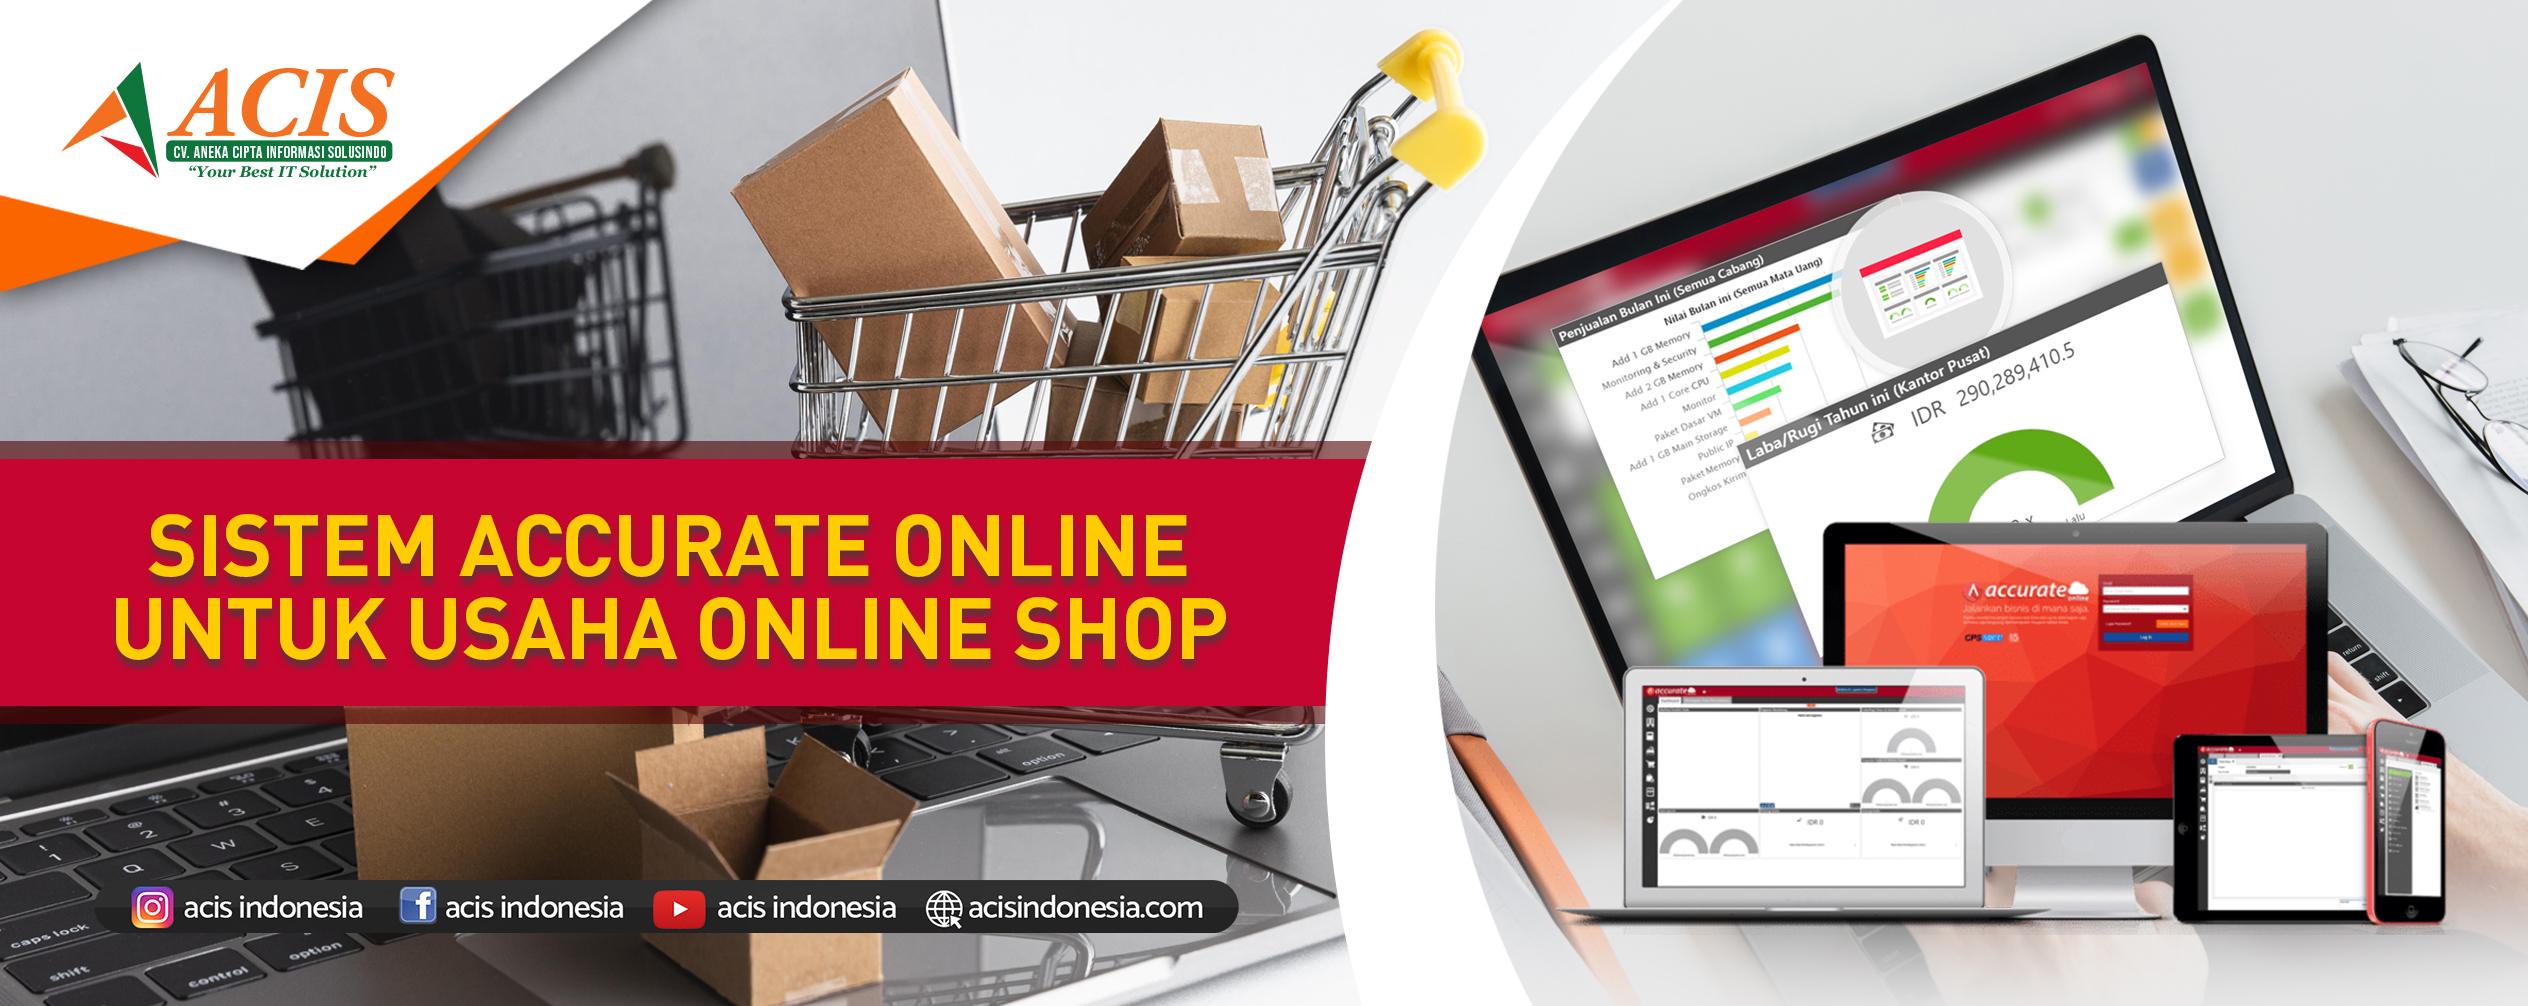 Accurate online untuk usaha online shop